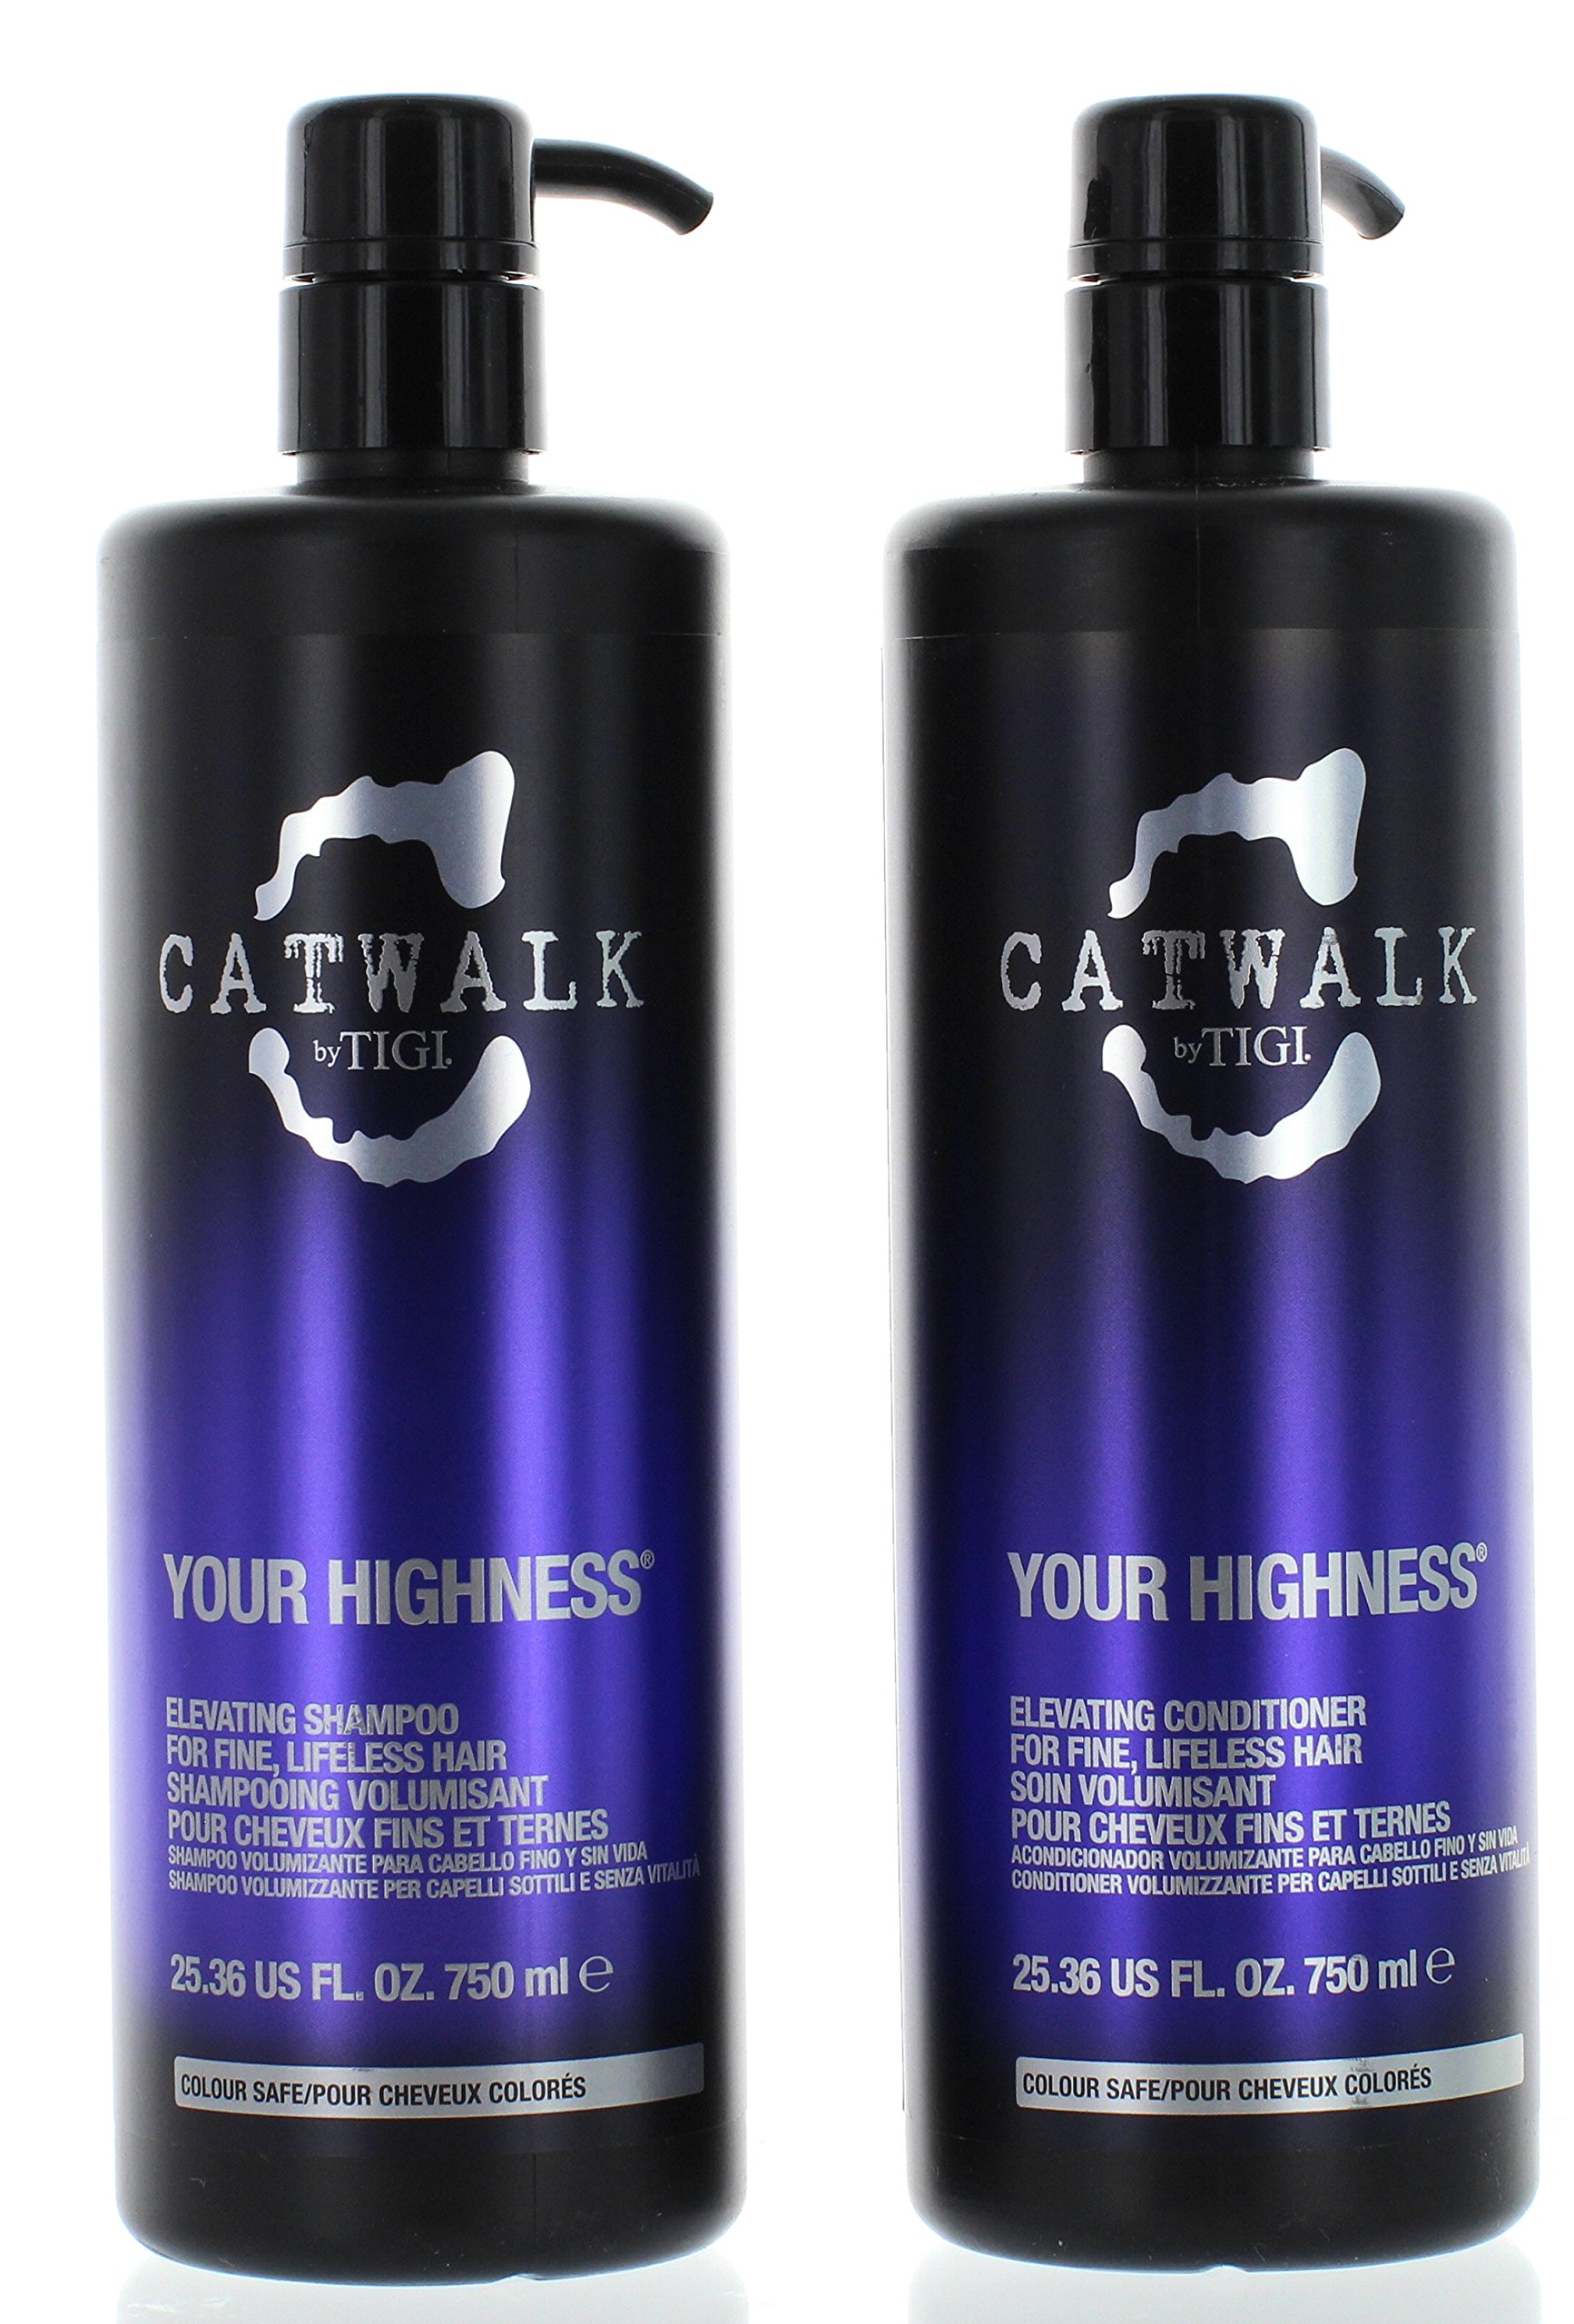 TIGI Catwalk Your Highness Volume Tween, 25.36 Oz Volumizing Shampoo and Conditioner Duo